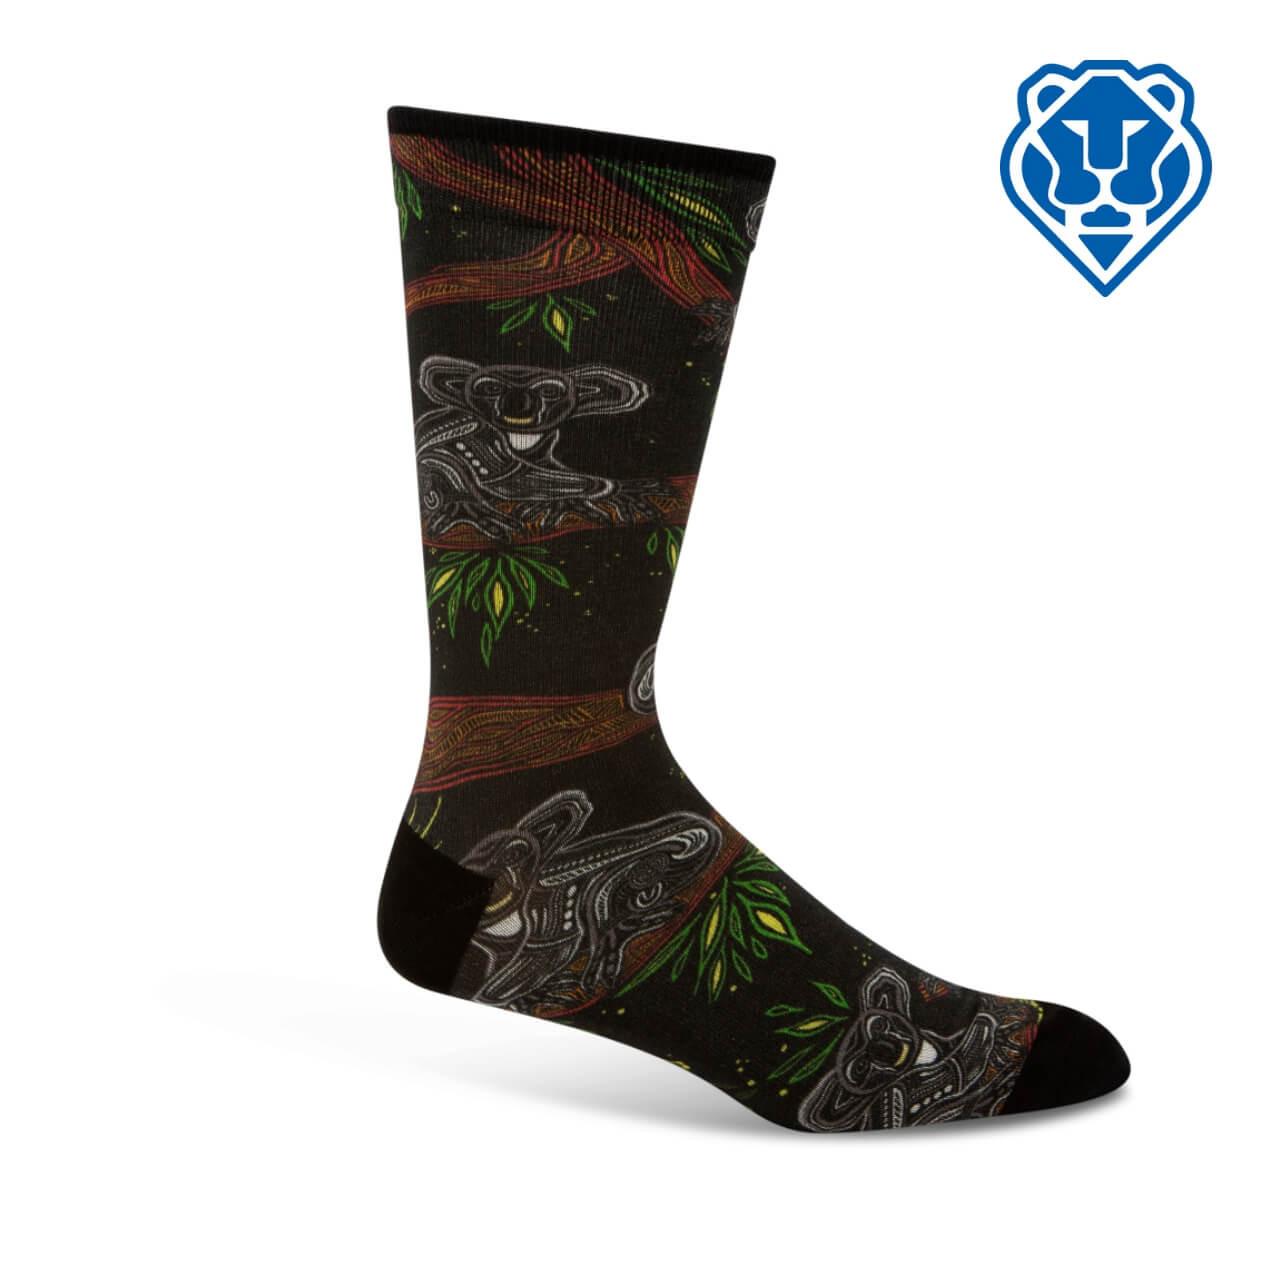 Image of Indigenous Australian Koala Sock